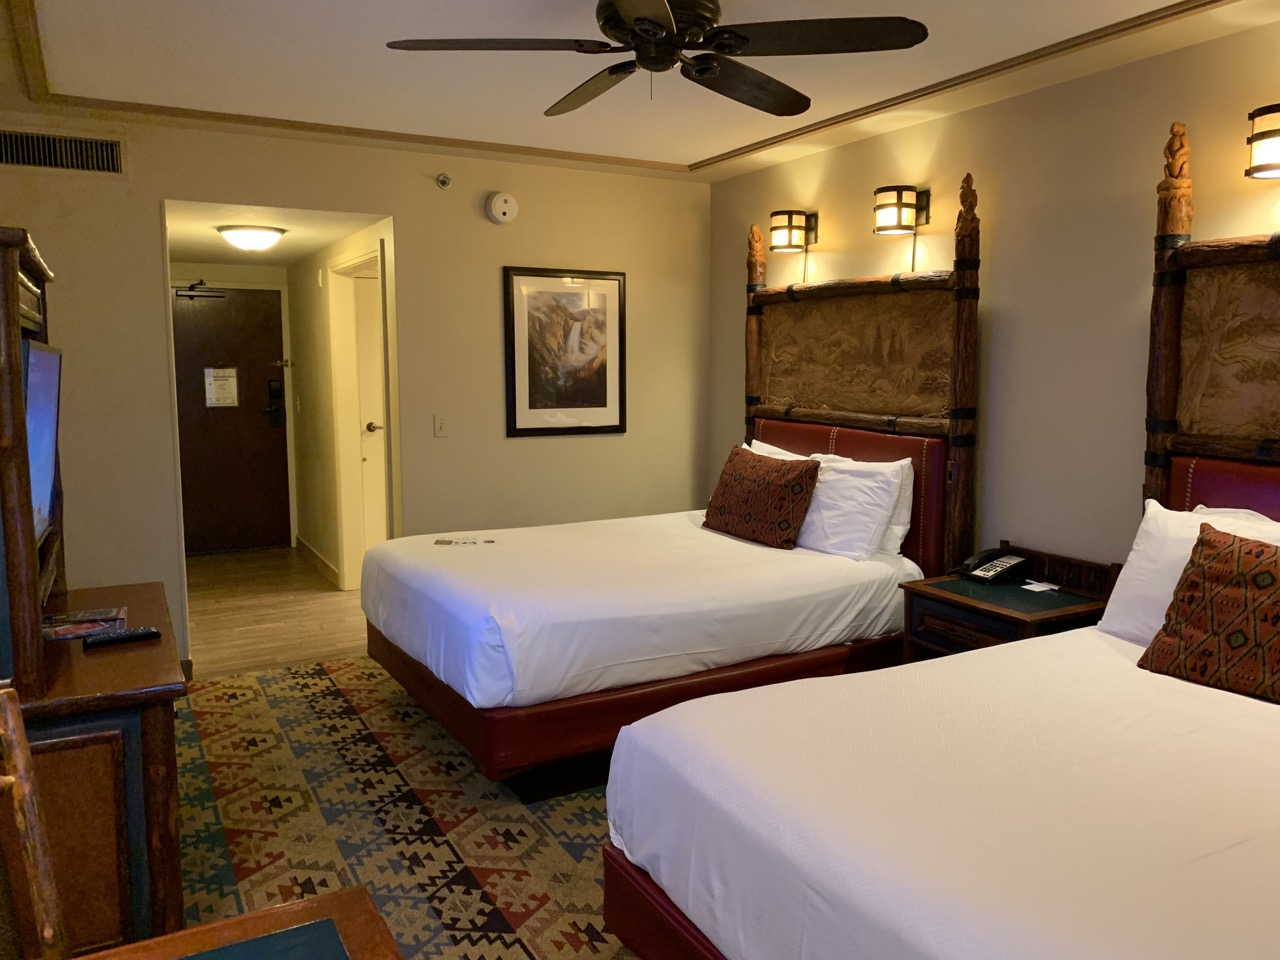 disney world best deluxe resort hotel ranking 07 wilderness lodge room.jpeg